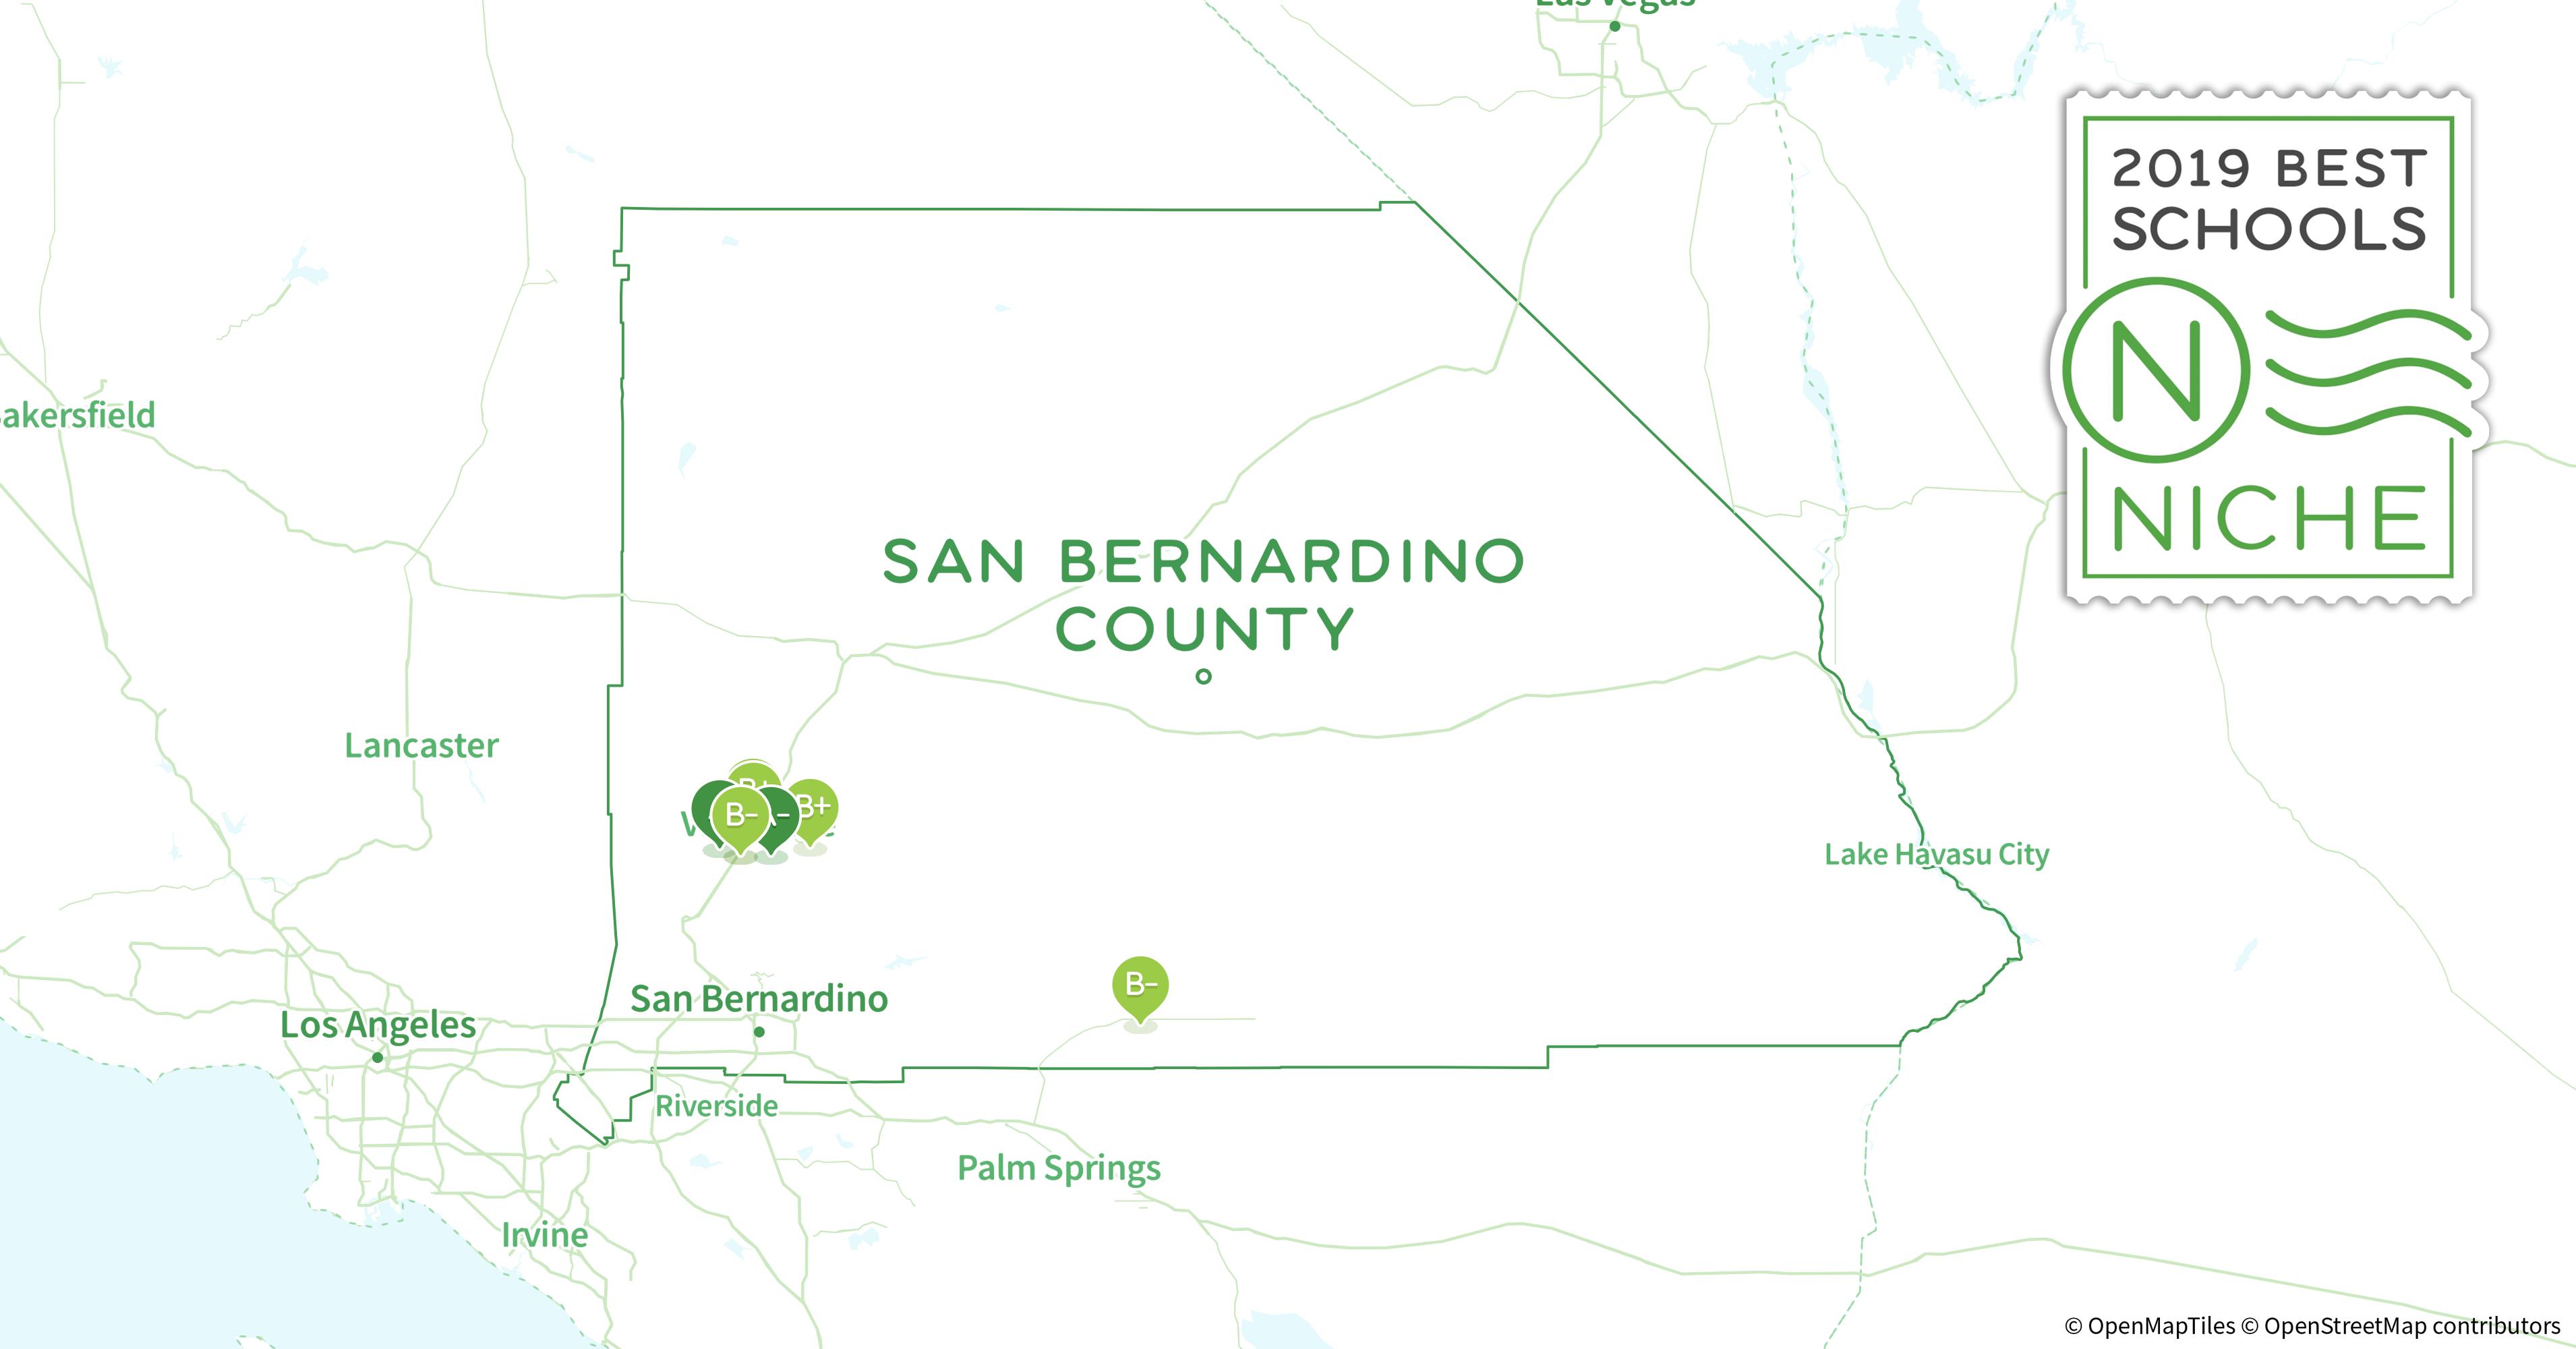 School Districts In San Bernardino County Ca Niche